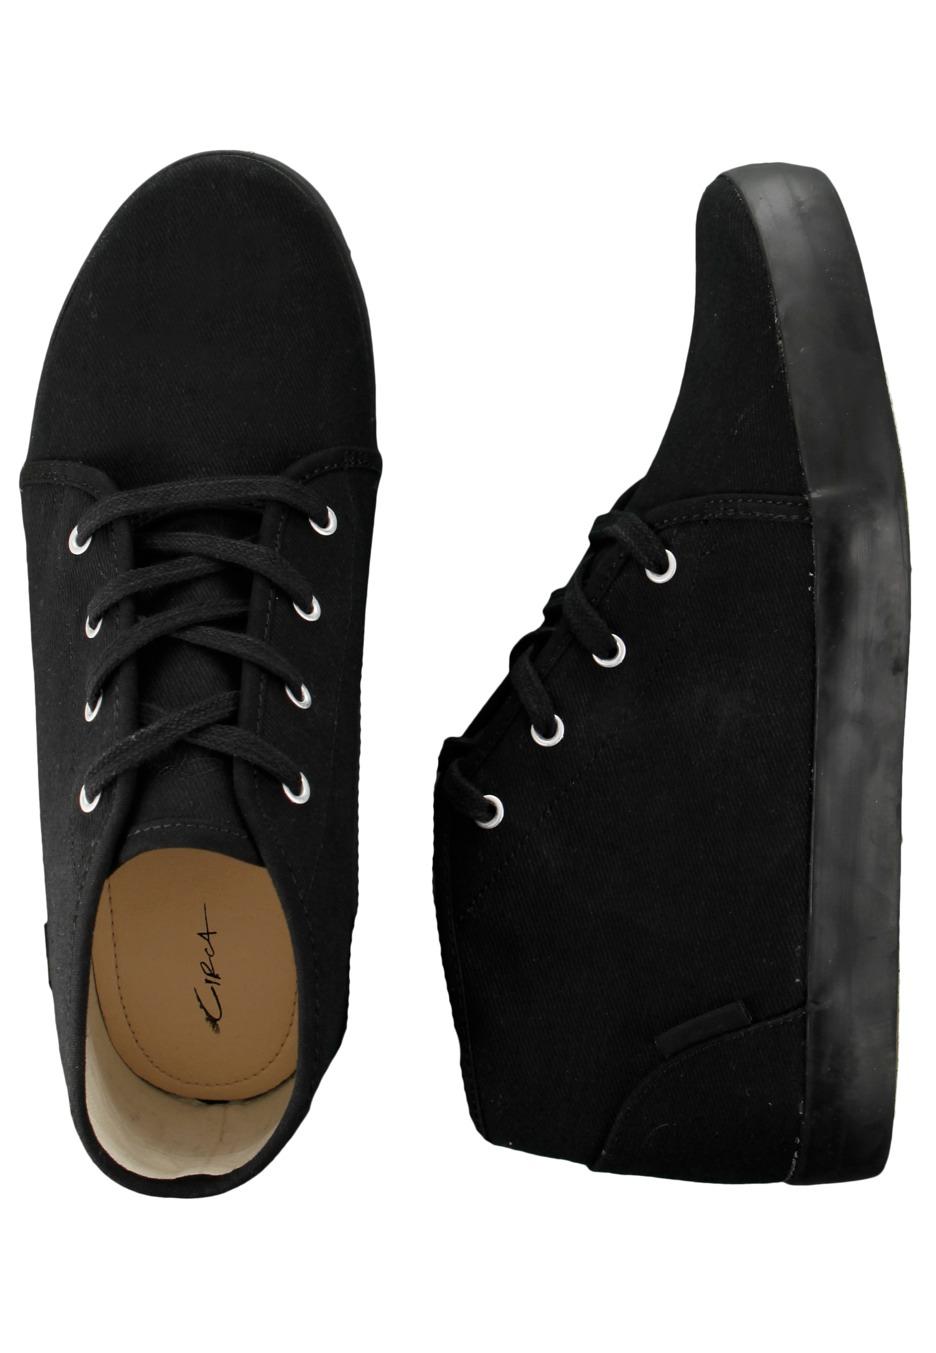 Deutschland Shoes Uk